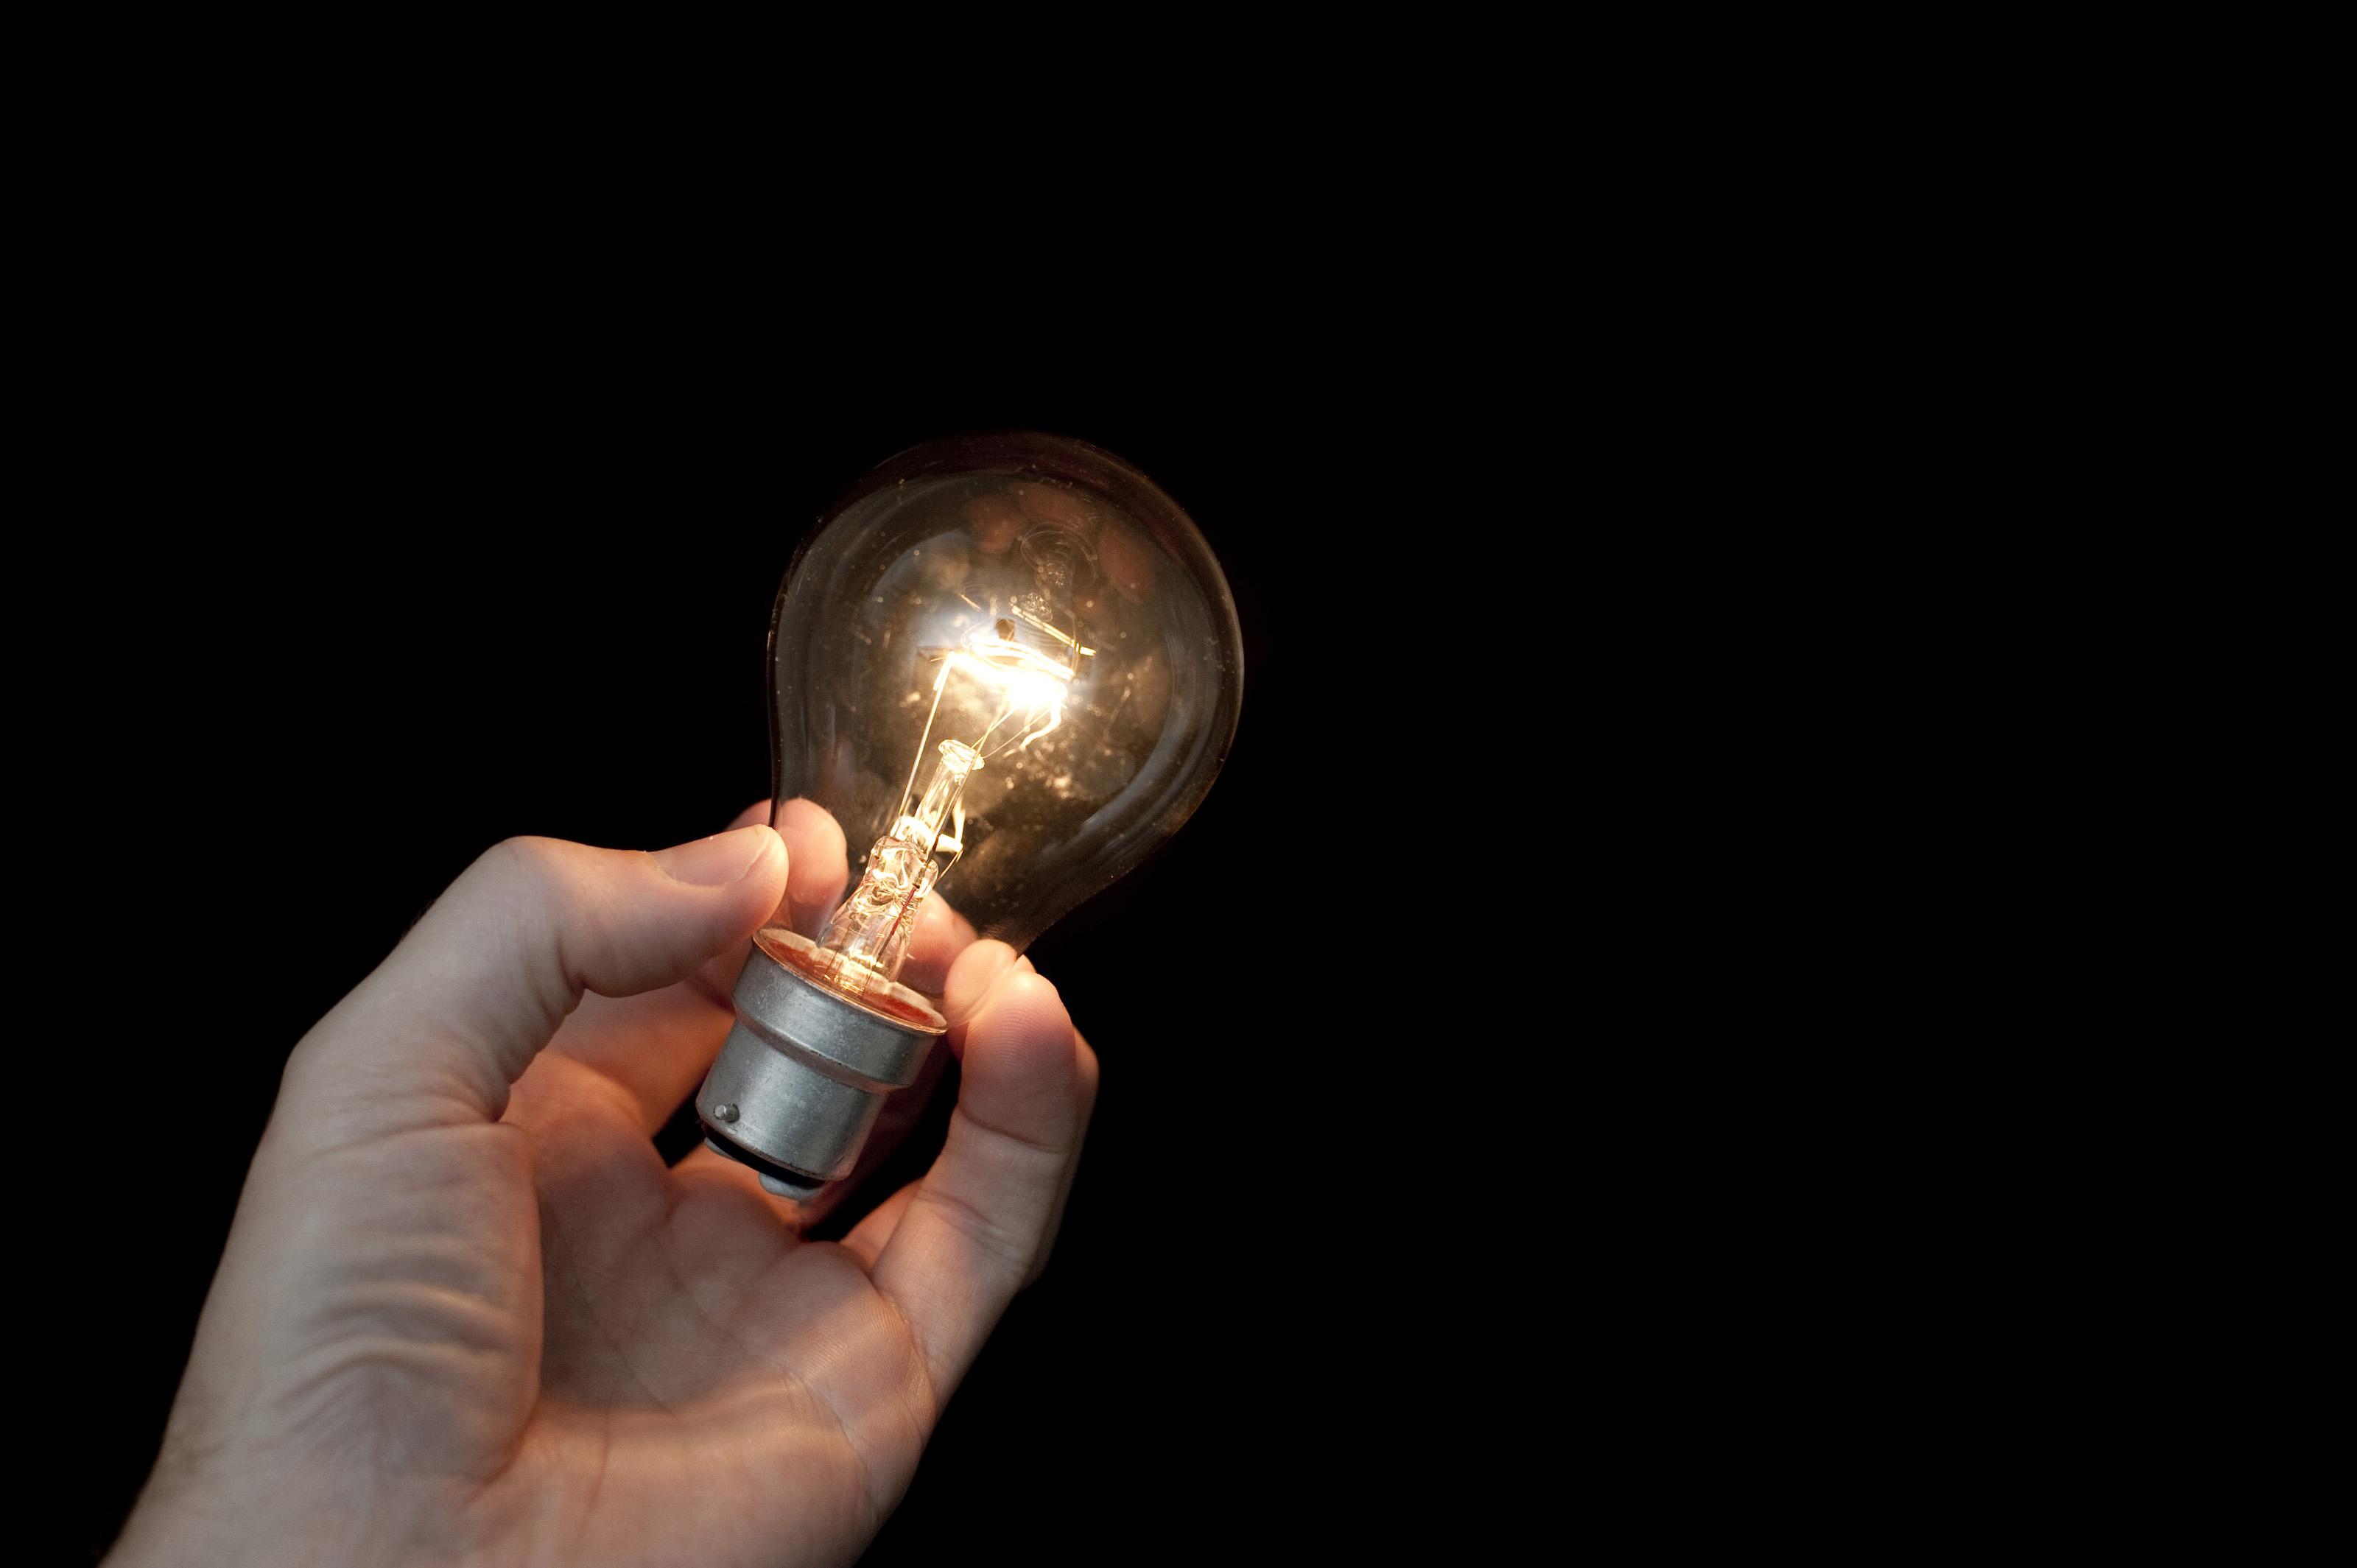 Free image of bright ideas